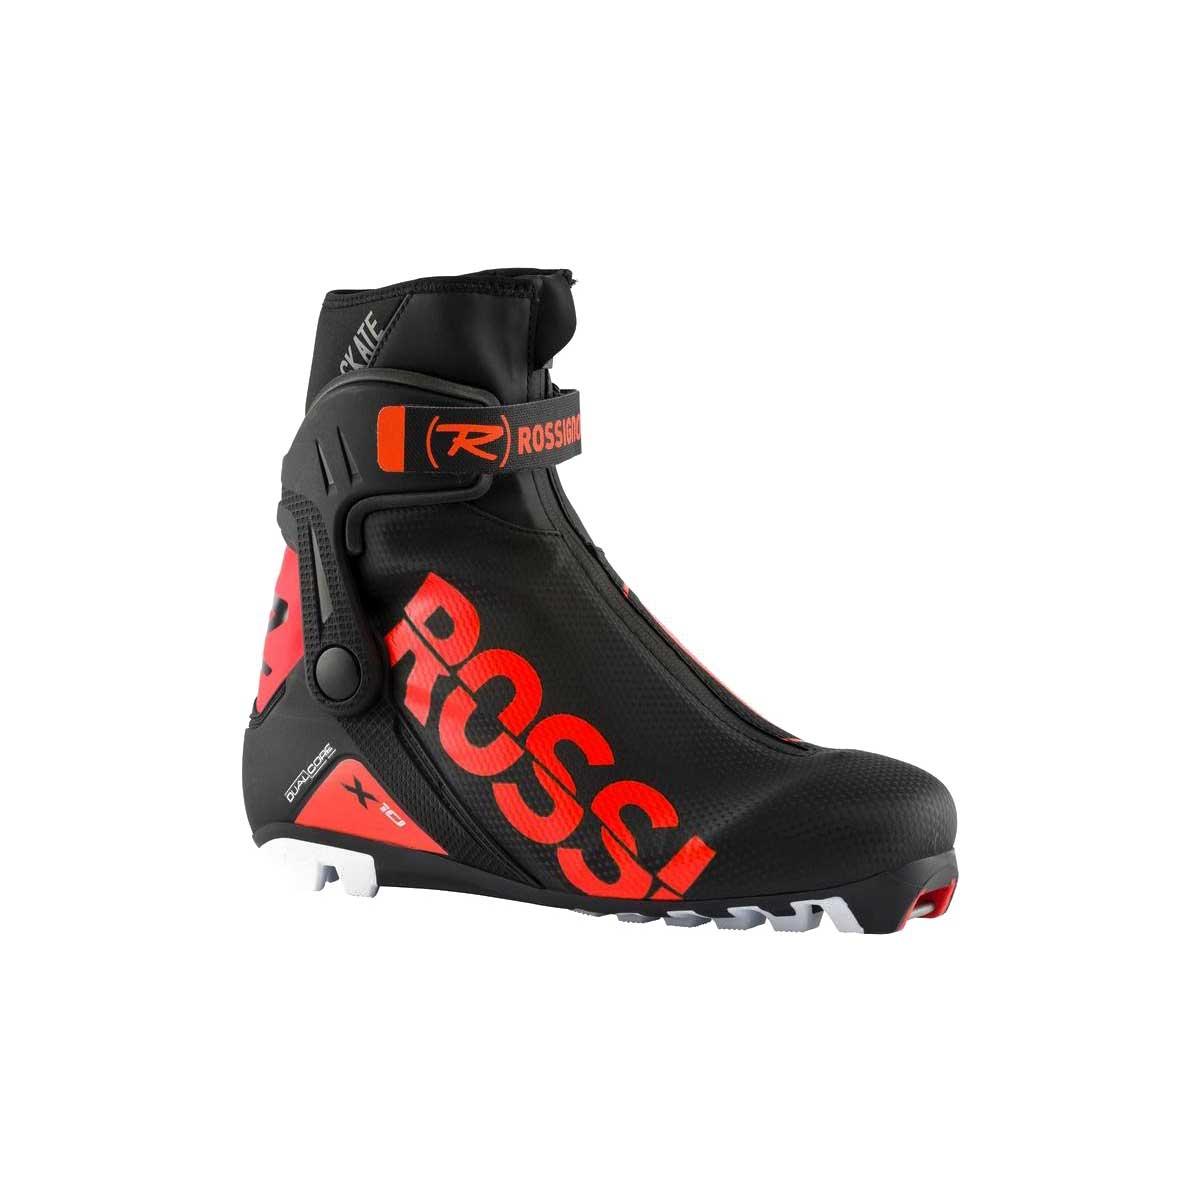 Rossignol X-10 Skate Boot